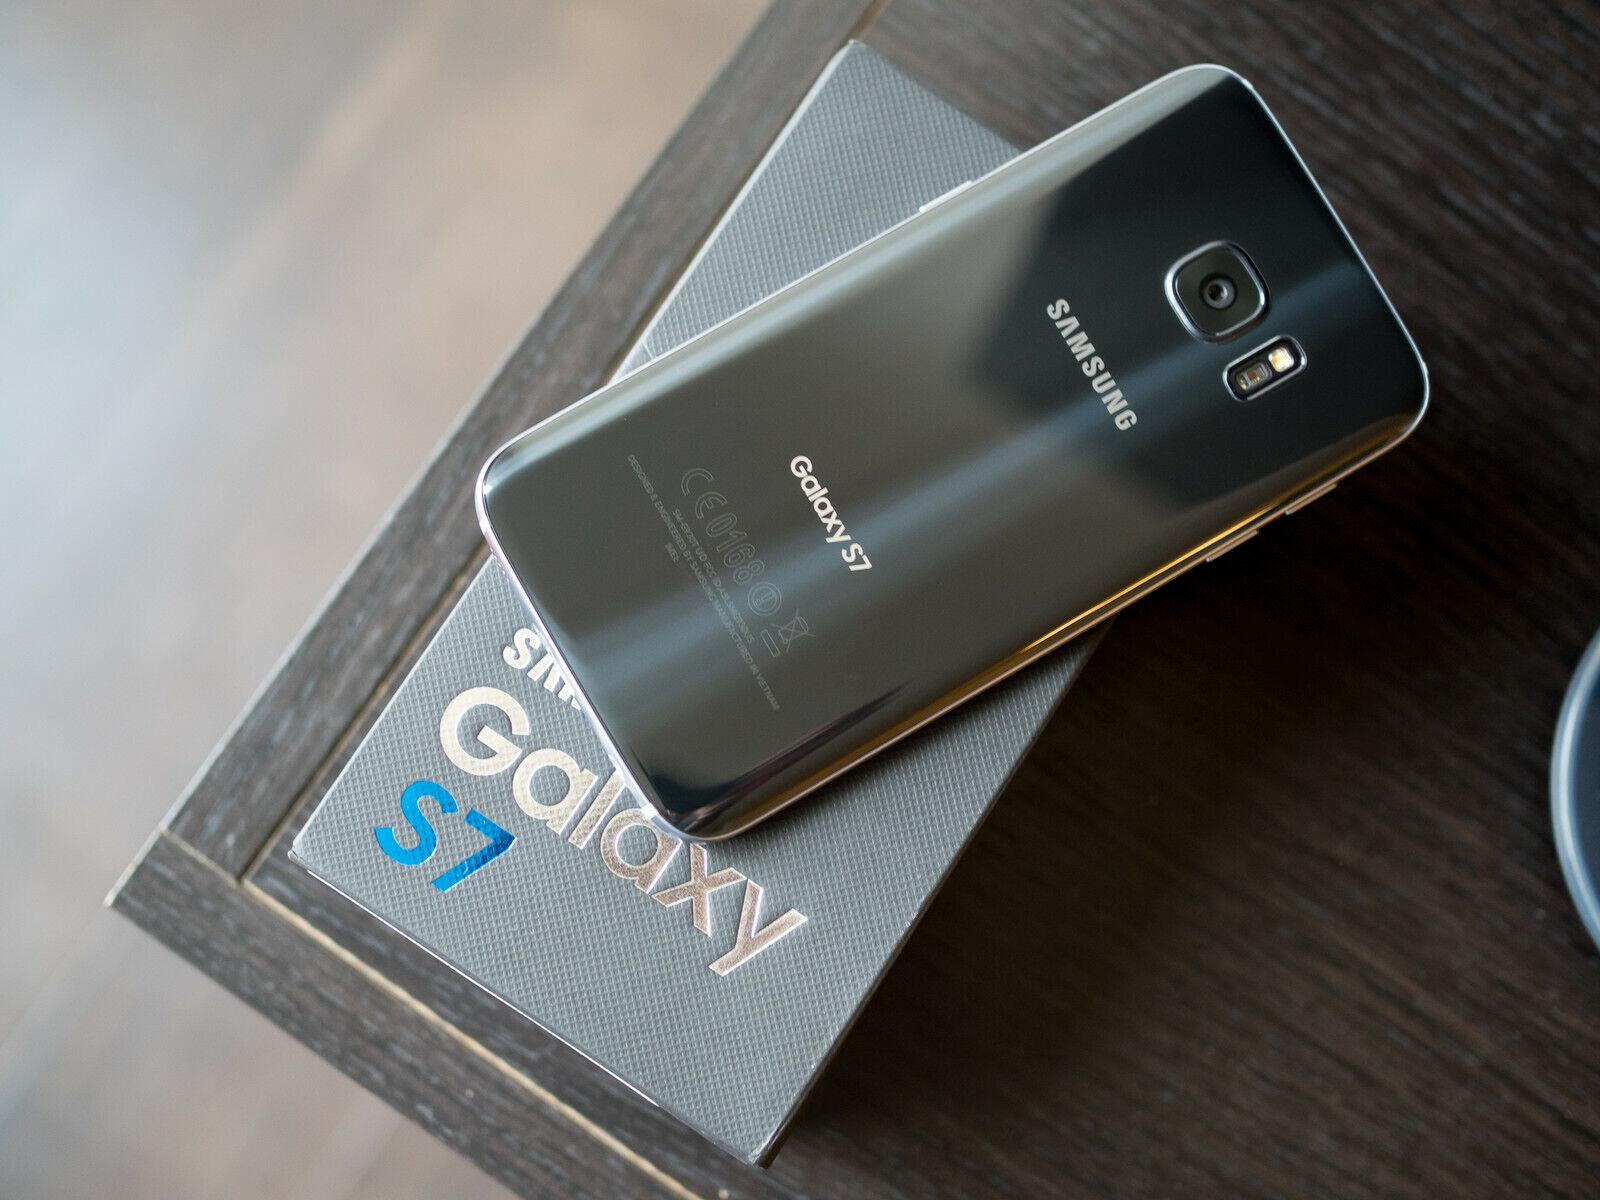 Android Phone - Samsung Galaxy S7 32GB G930U - AT&T Verizon Sprint Boost TracFone GSM Unlocked